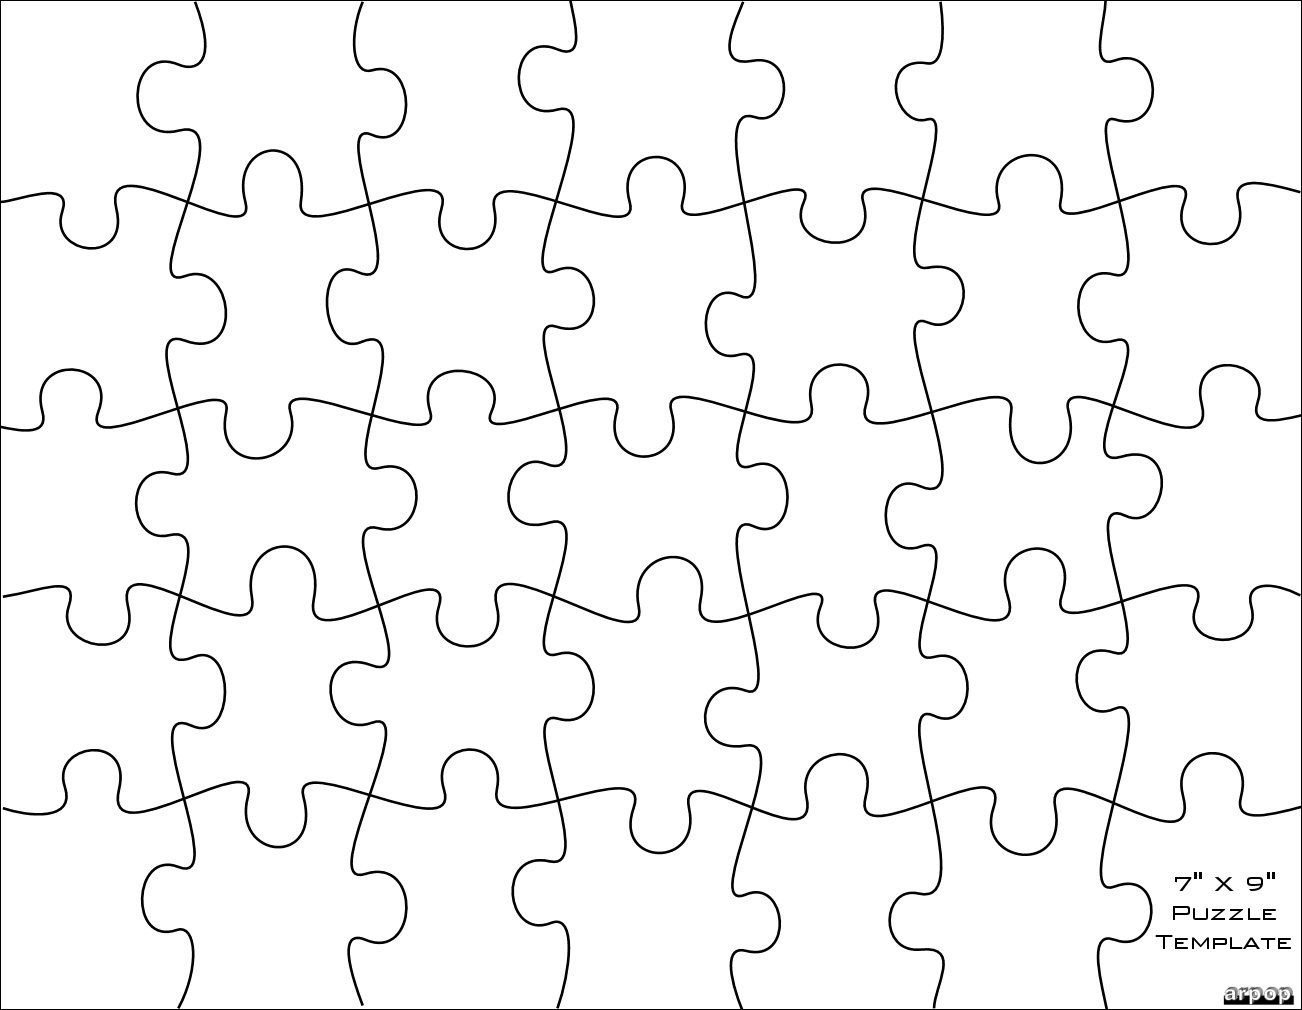 Free Scroll Saw Patternsarpop: Jigsaw Puzzle Templates | School - Printable Puzzle Jigsaw